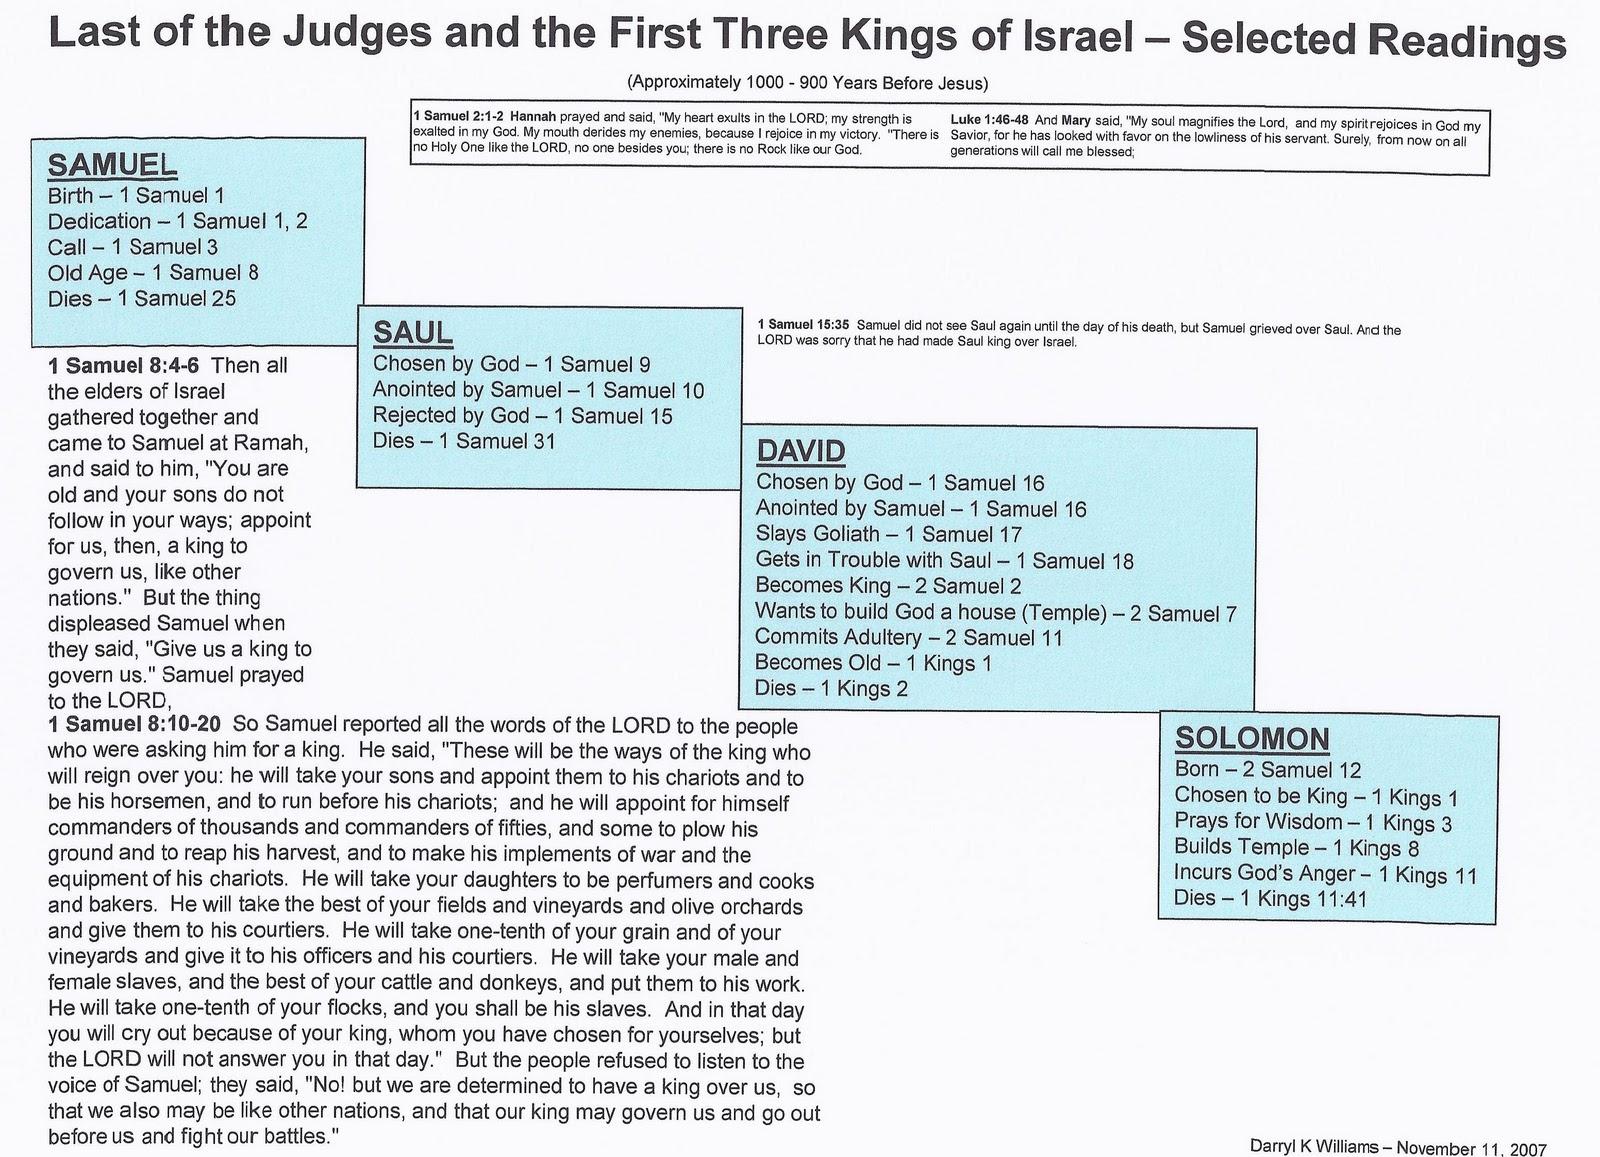 Last Of All Samuel Saul David And Solomon